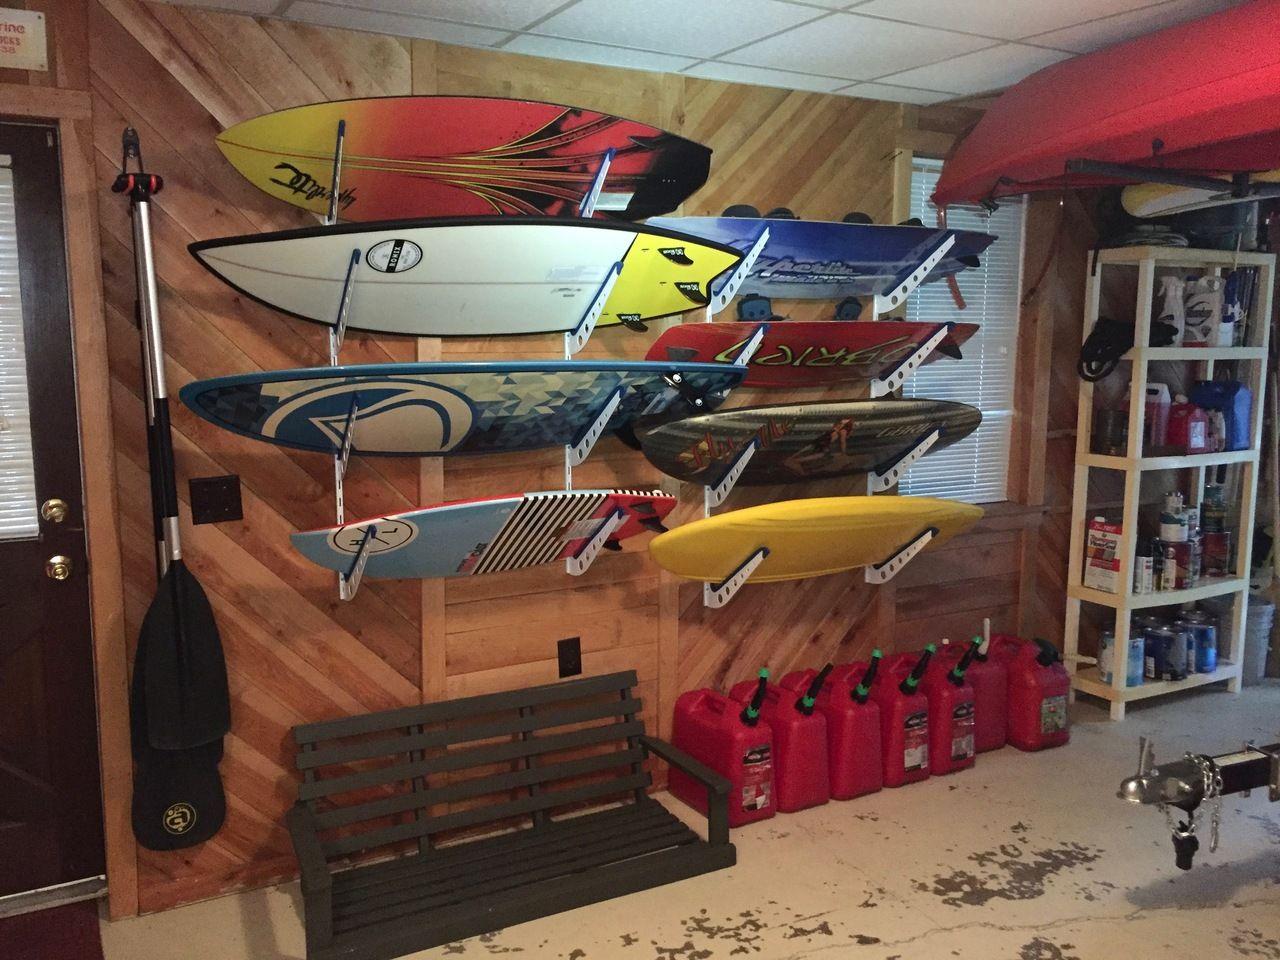 Wakeboard Surfboard Storage Racks For The Garage Wakesurfing